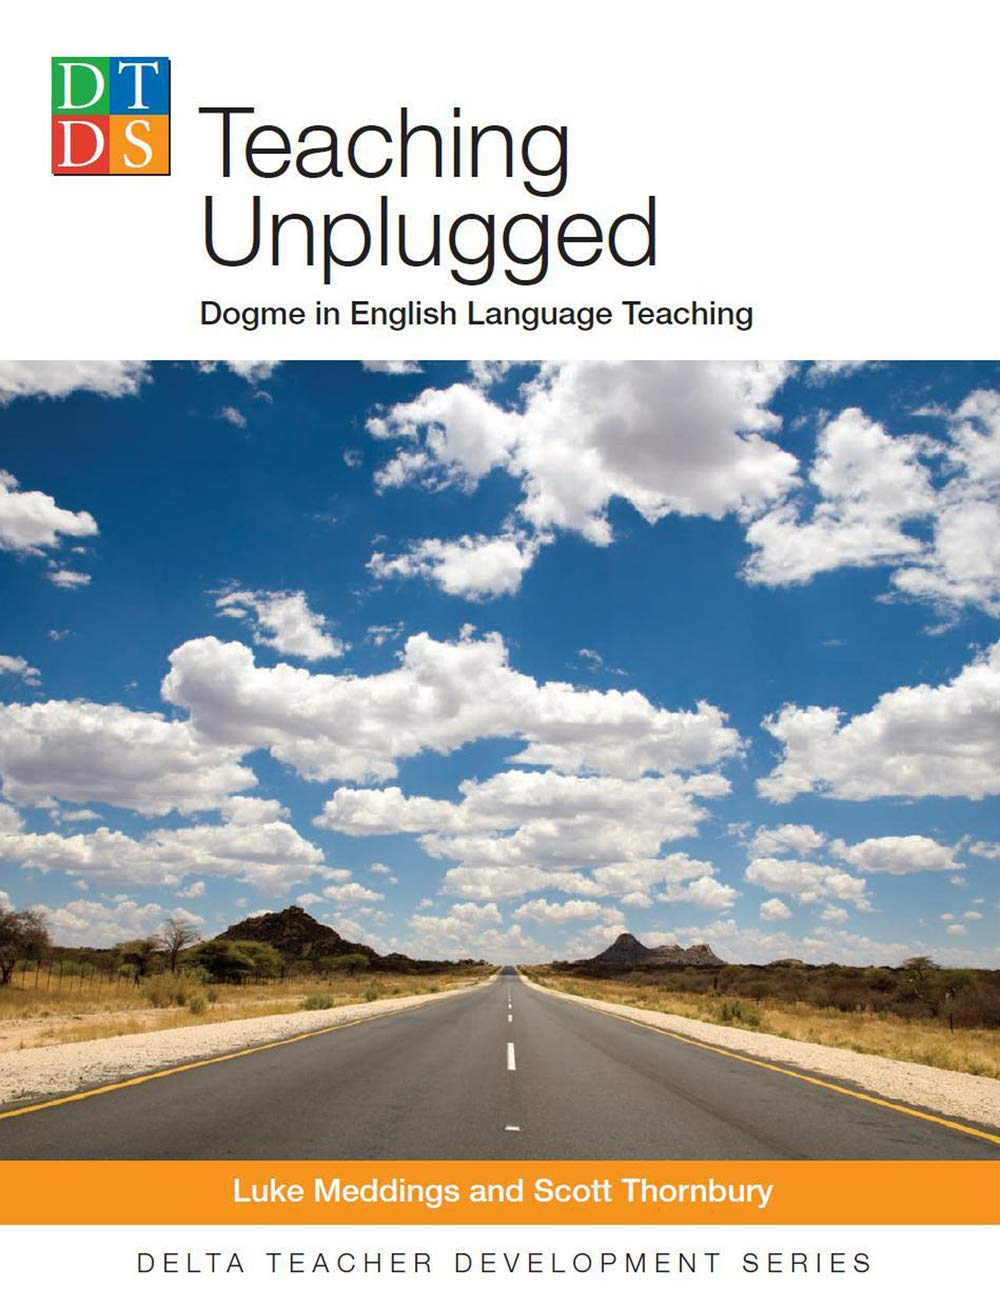 Download Teaching Unplugged: Dogme in English Language Teaching (Delta Teacher Development Series) ebook